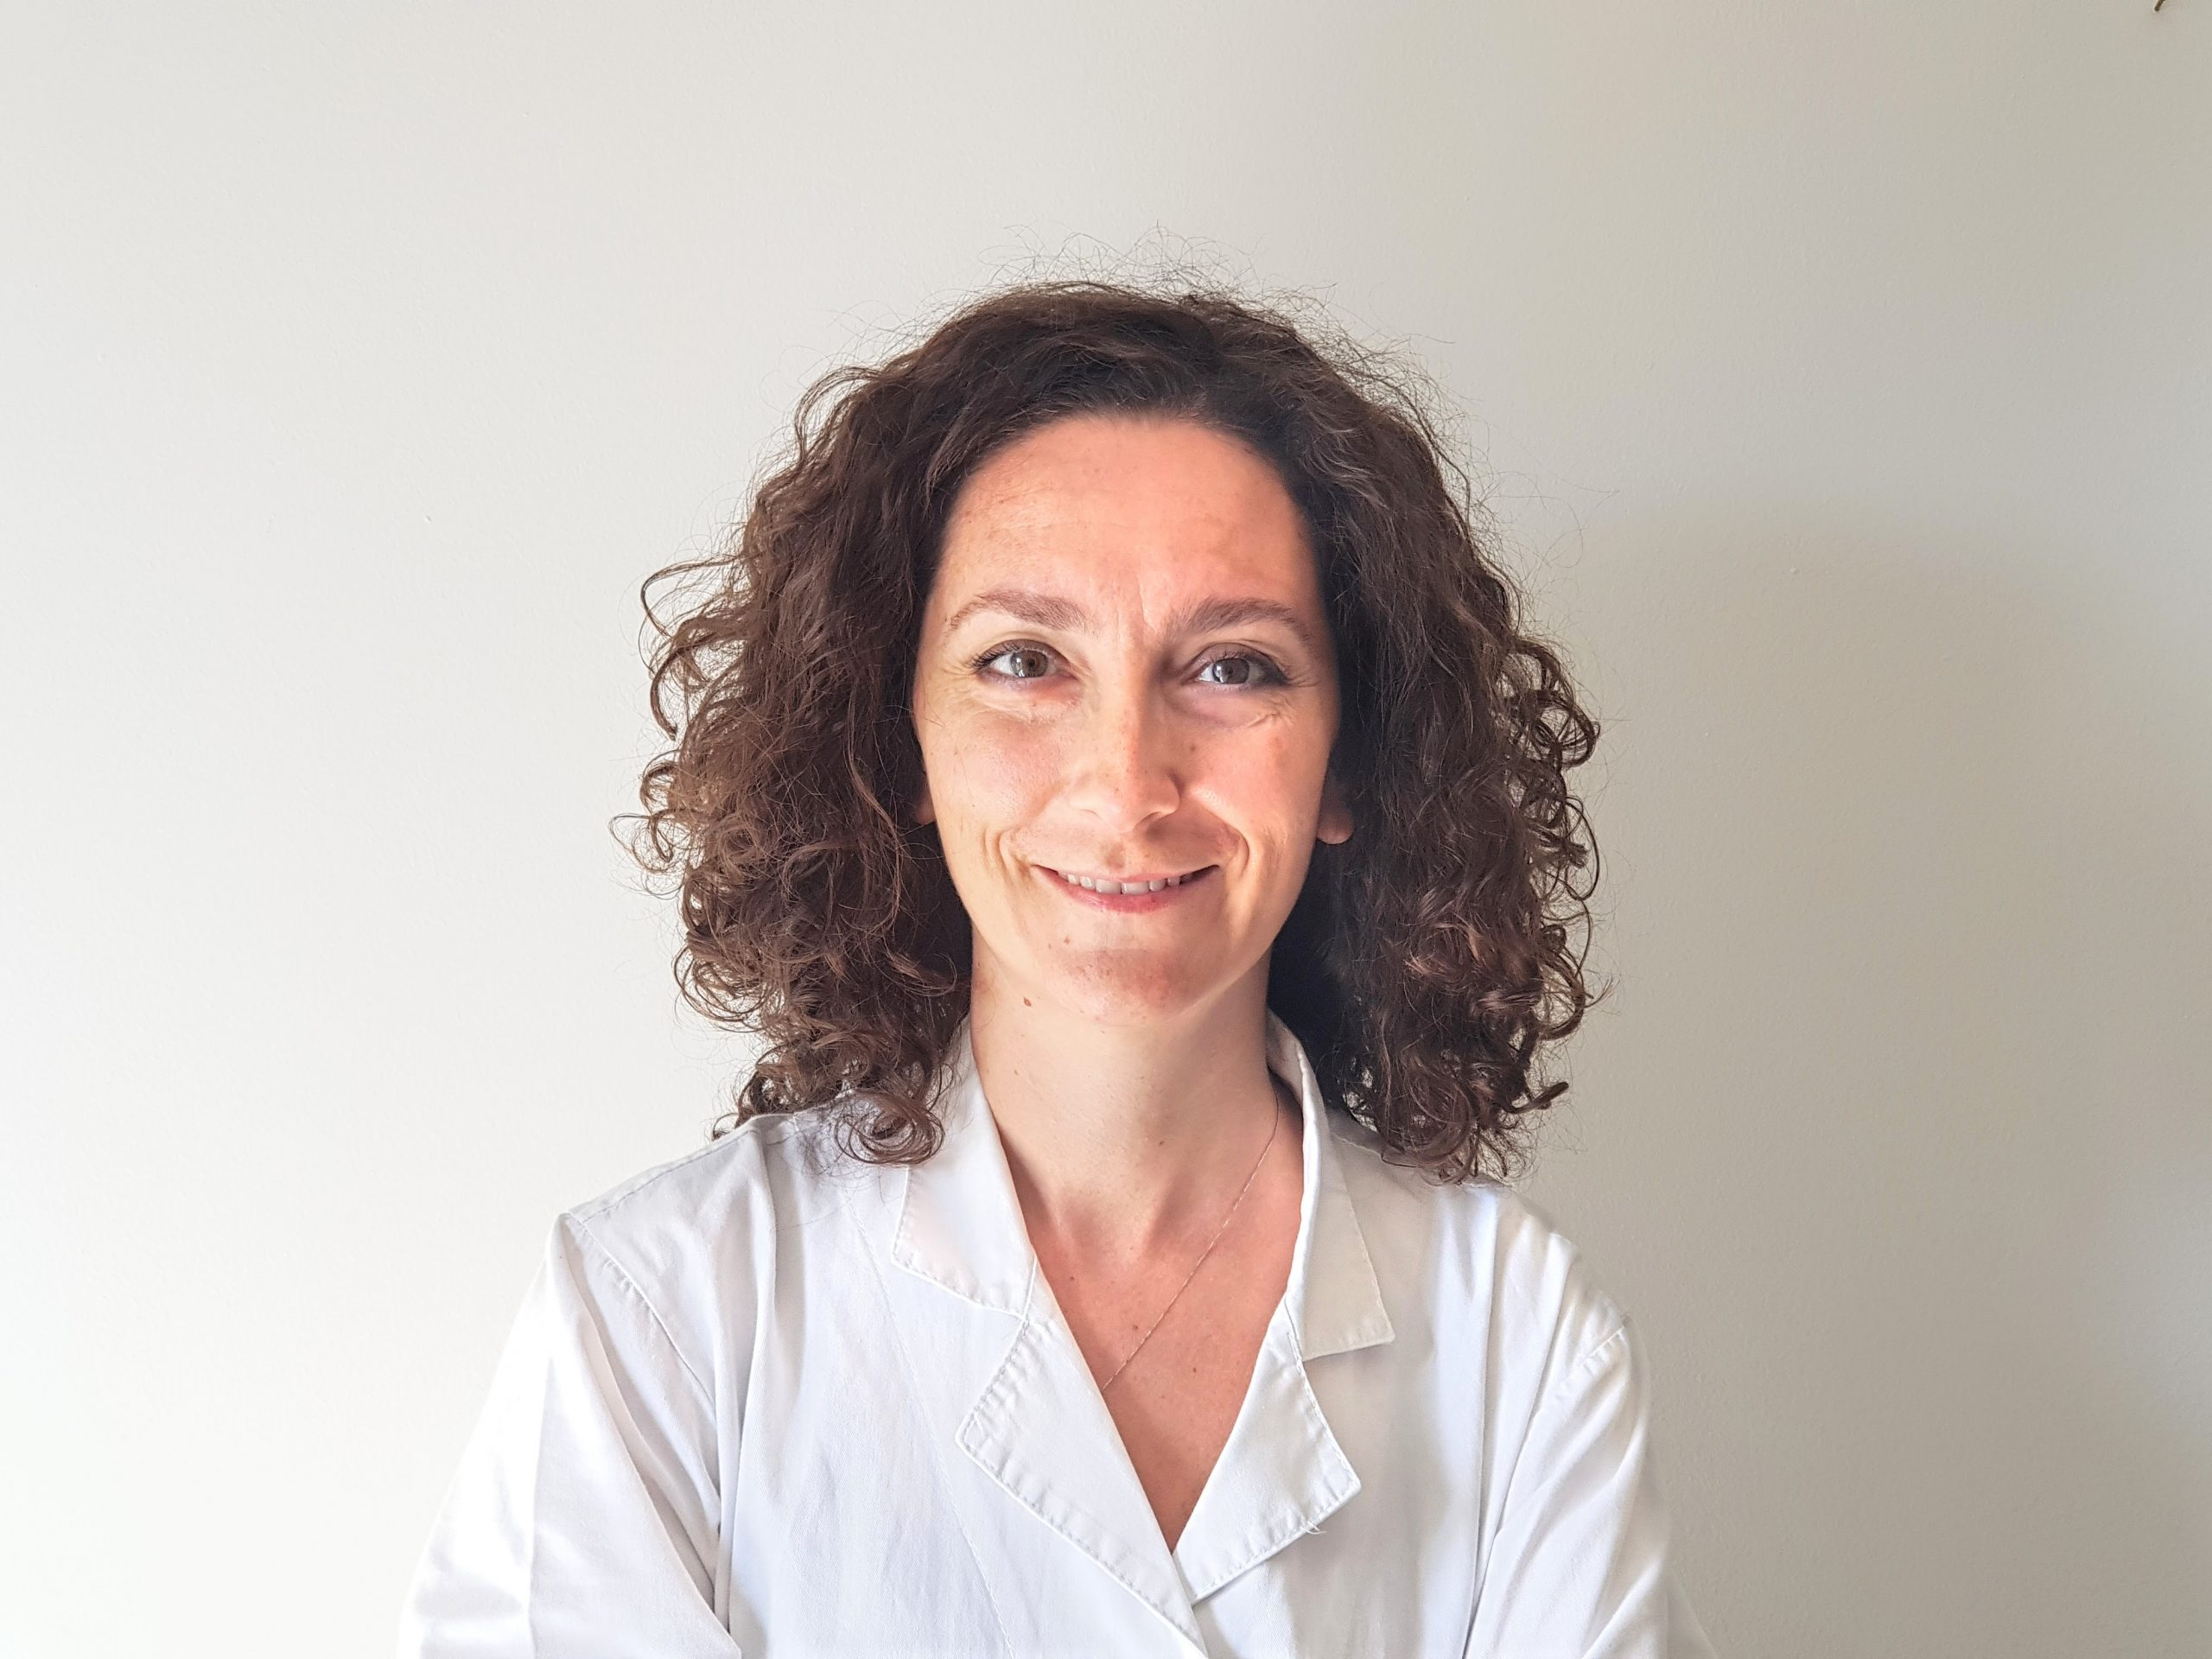 Chiara Marra